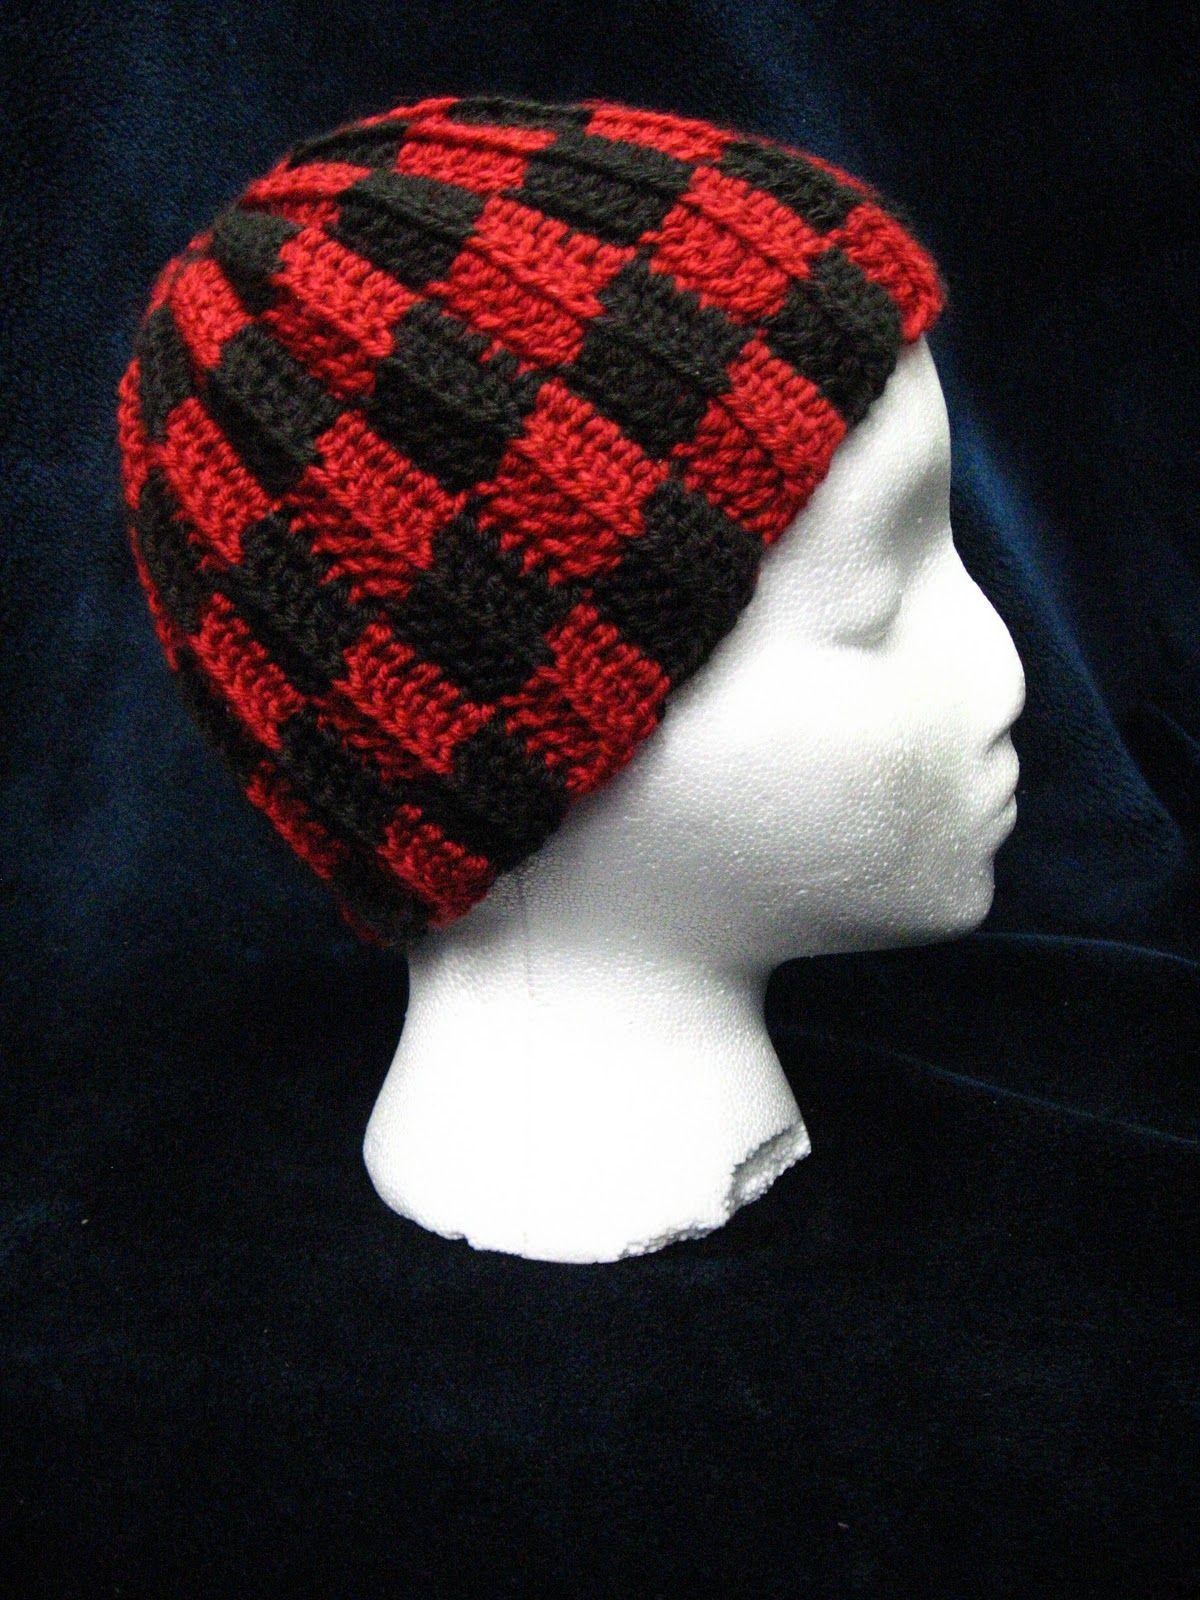 Yarn, Rocks, and Herps: Checkered Hat Crochet Pattern | Making Head ...